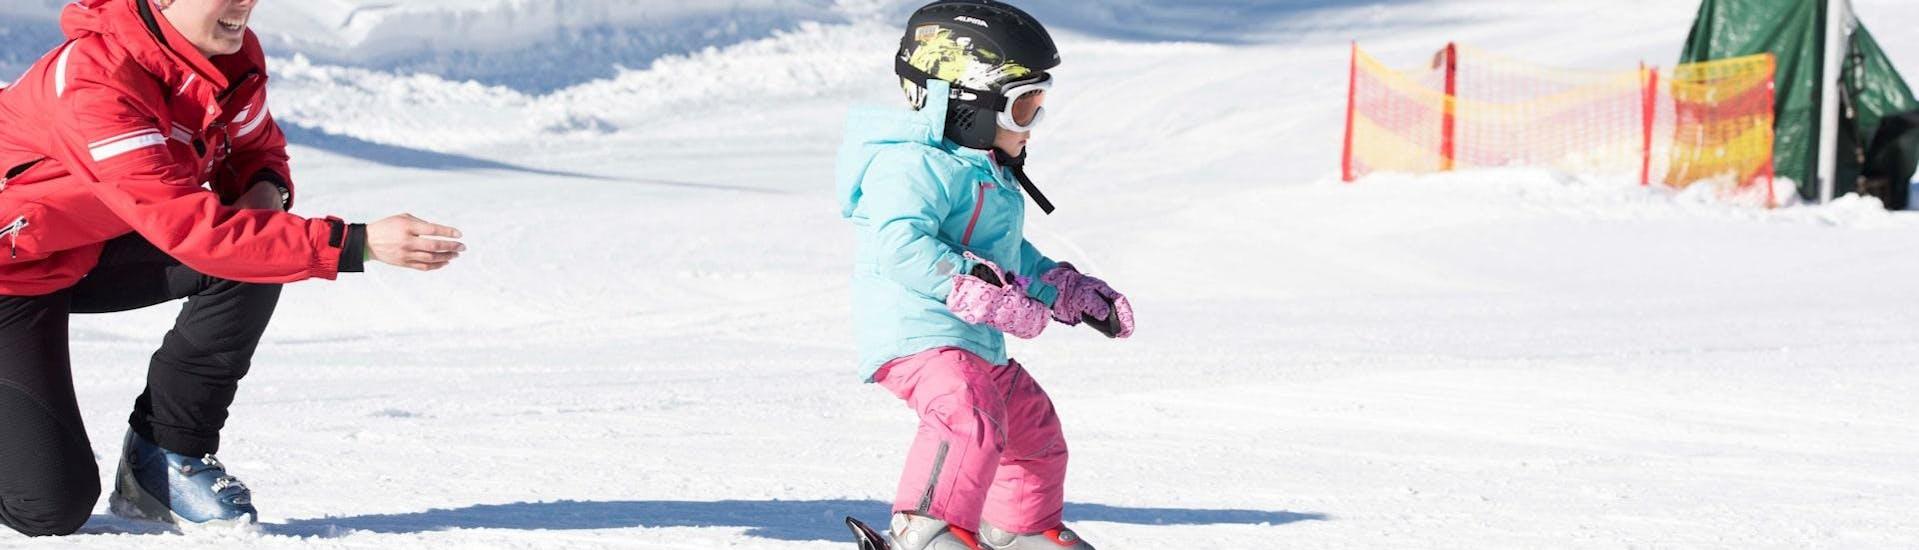 "Ski Lessons for Kids ""NOVI-Bambinis"" (3-4 years) - Beginner with Skischule Gaschurn-Partenen - Hero image"